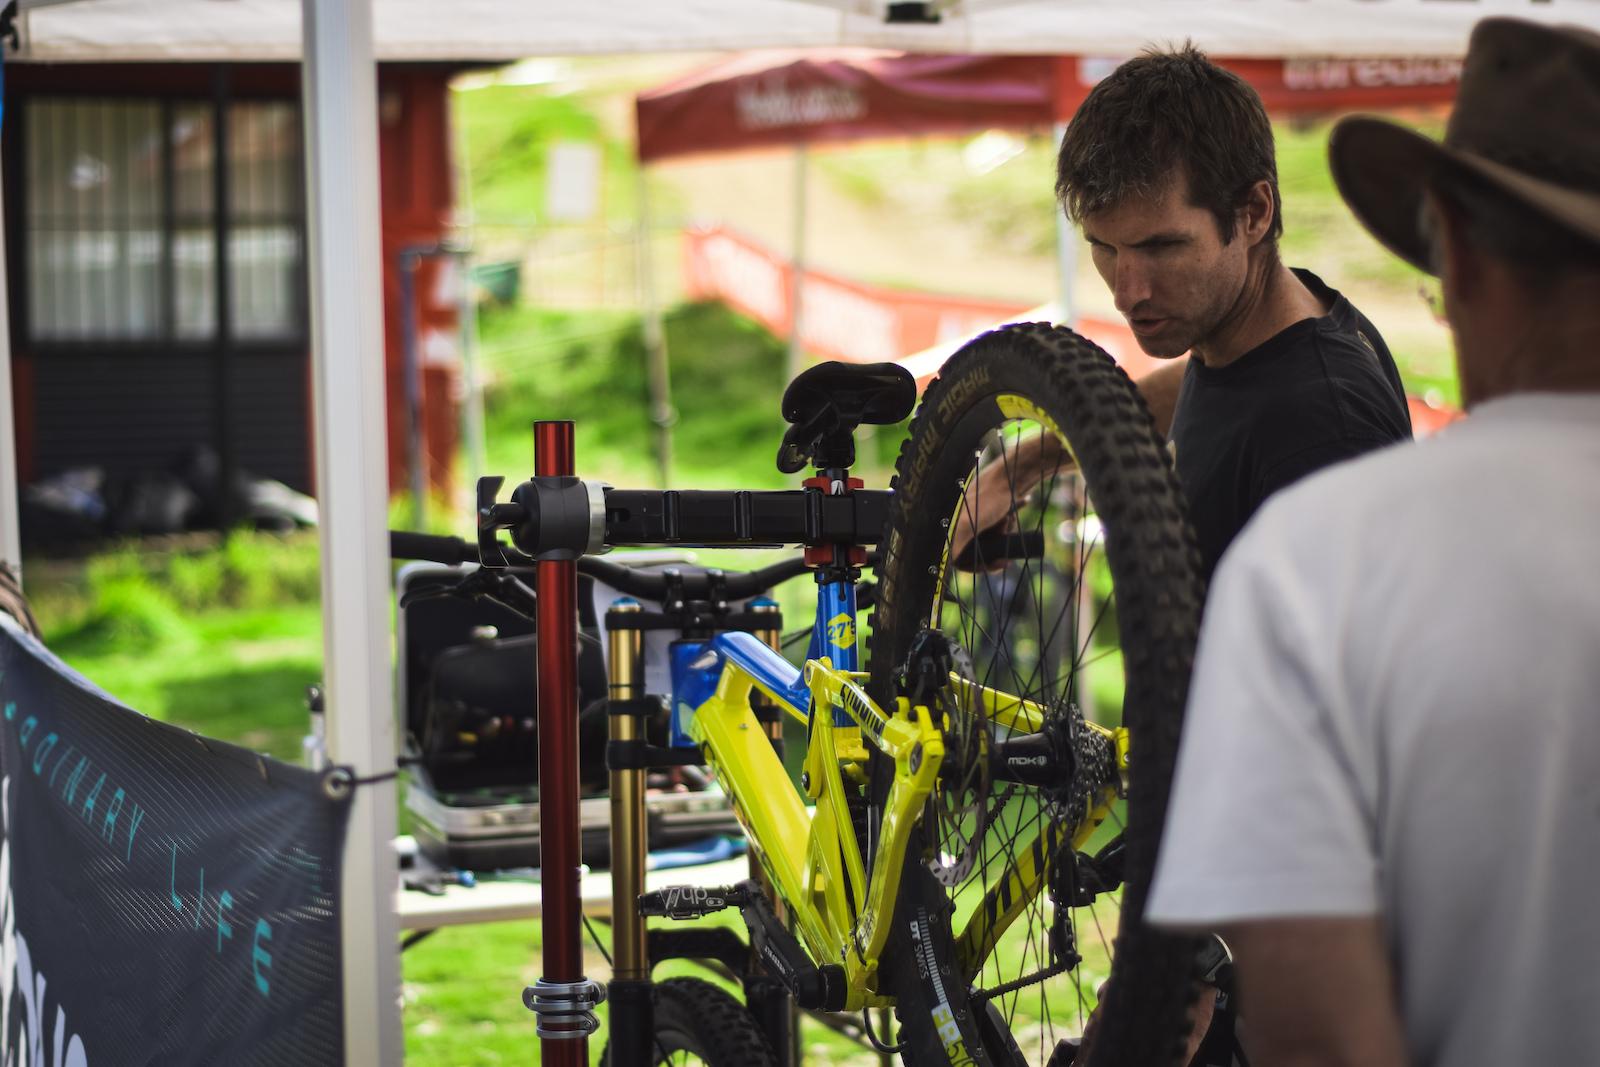 Paul working on team bikes